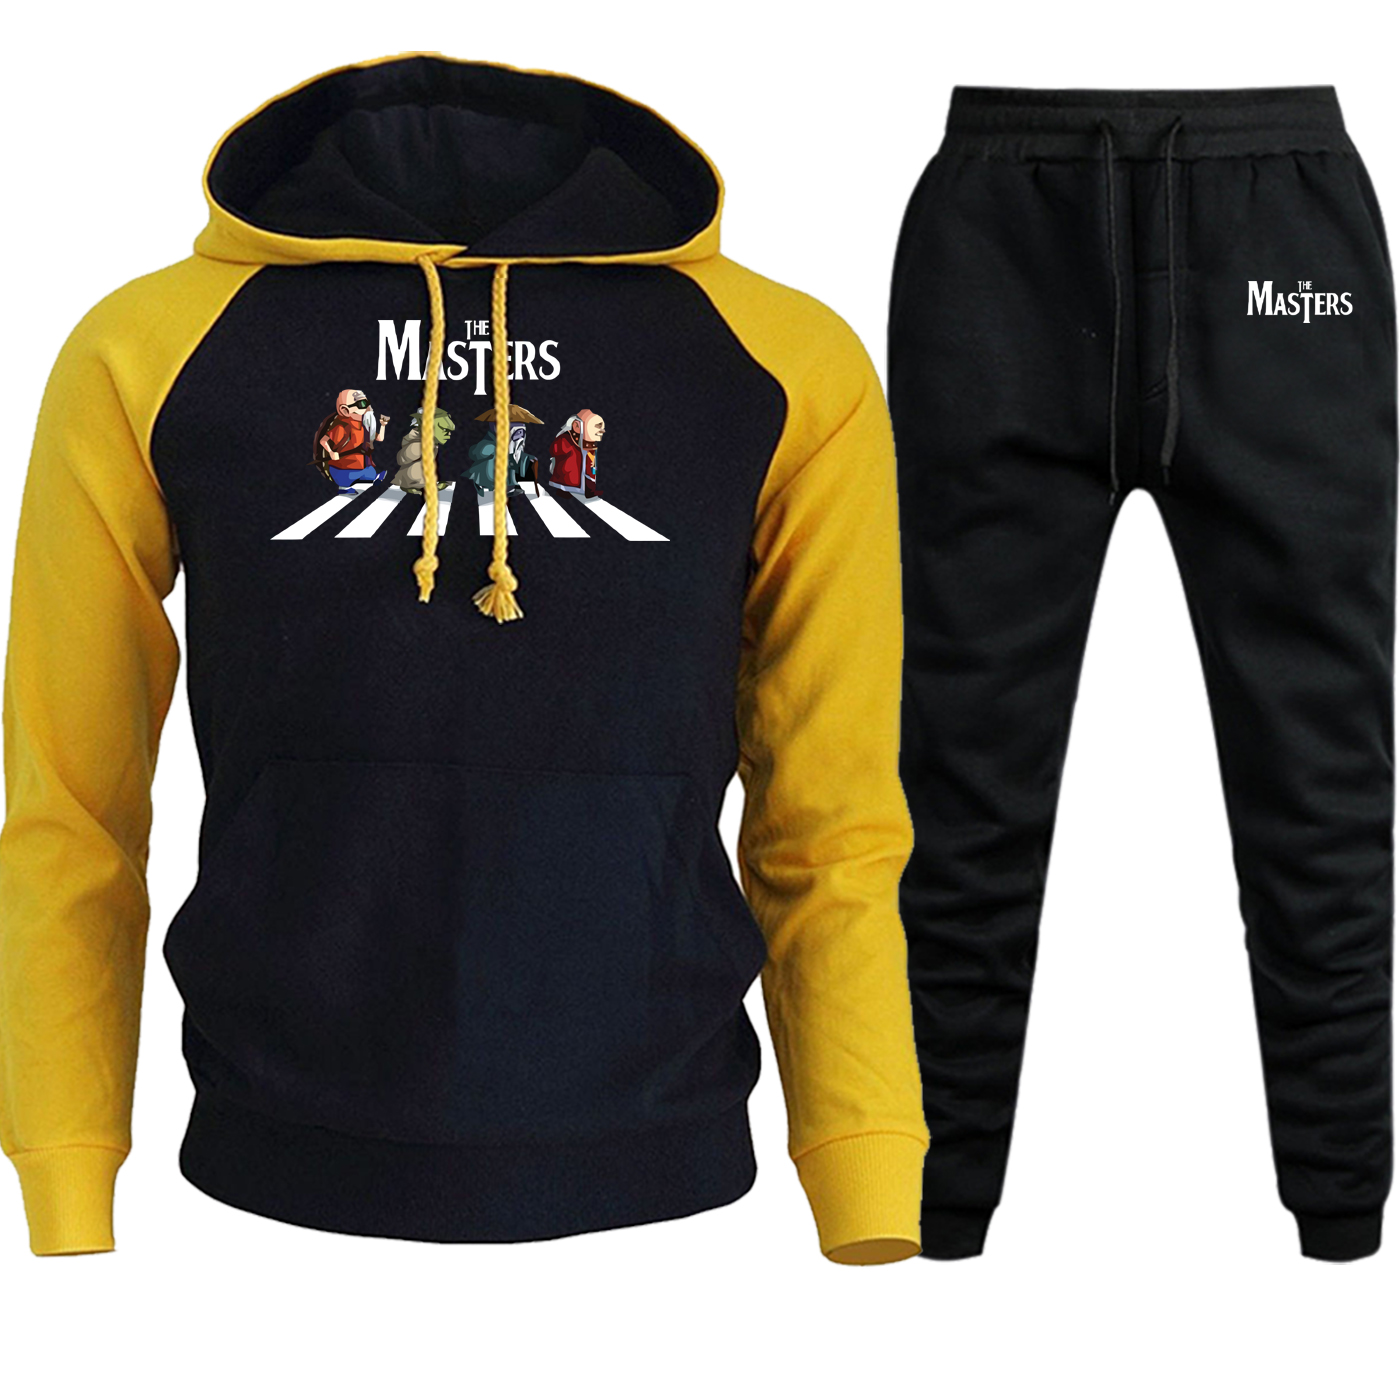 Streetweat Men Raglan Hoodie Autumn Winter 2019 New Master Roshi Dragon Ball Cartoon Hooded Suit Male Pullover+Pants 2 Piece Set